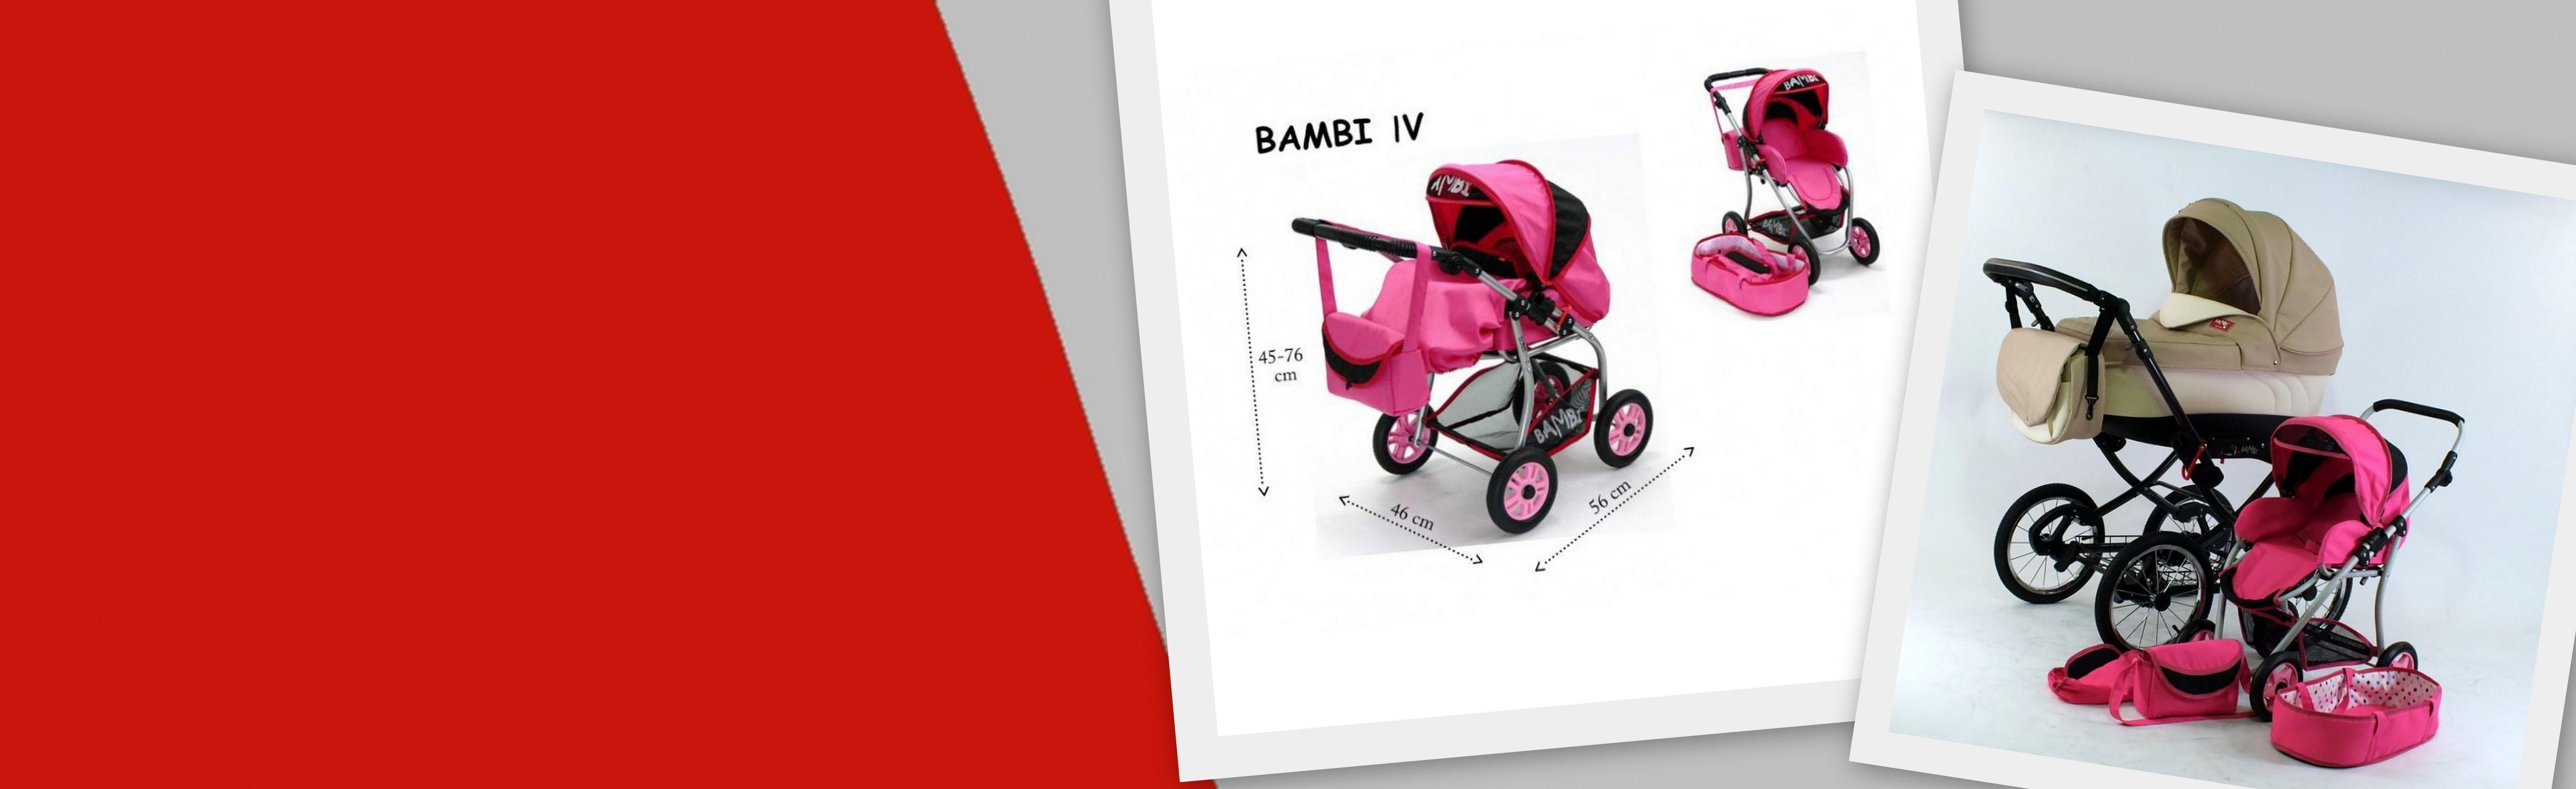 Wózek lalkowy Bambi